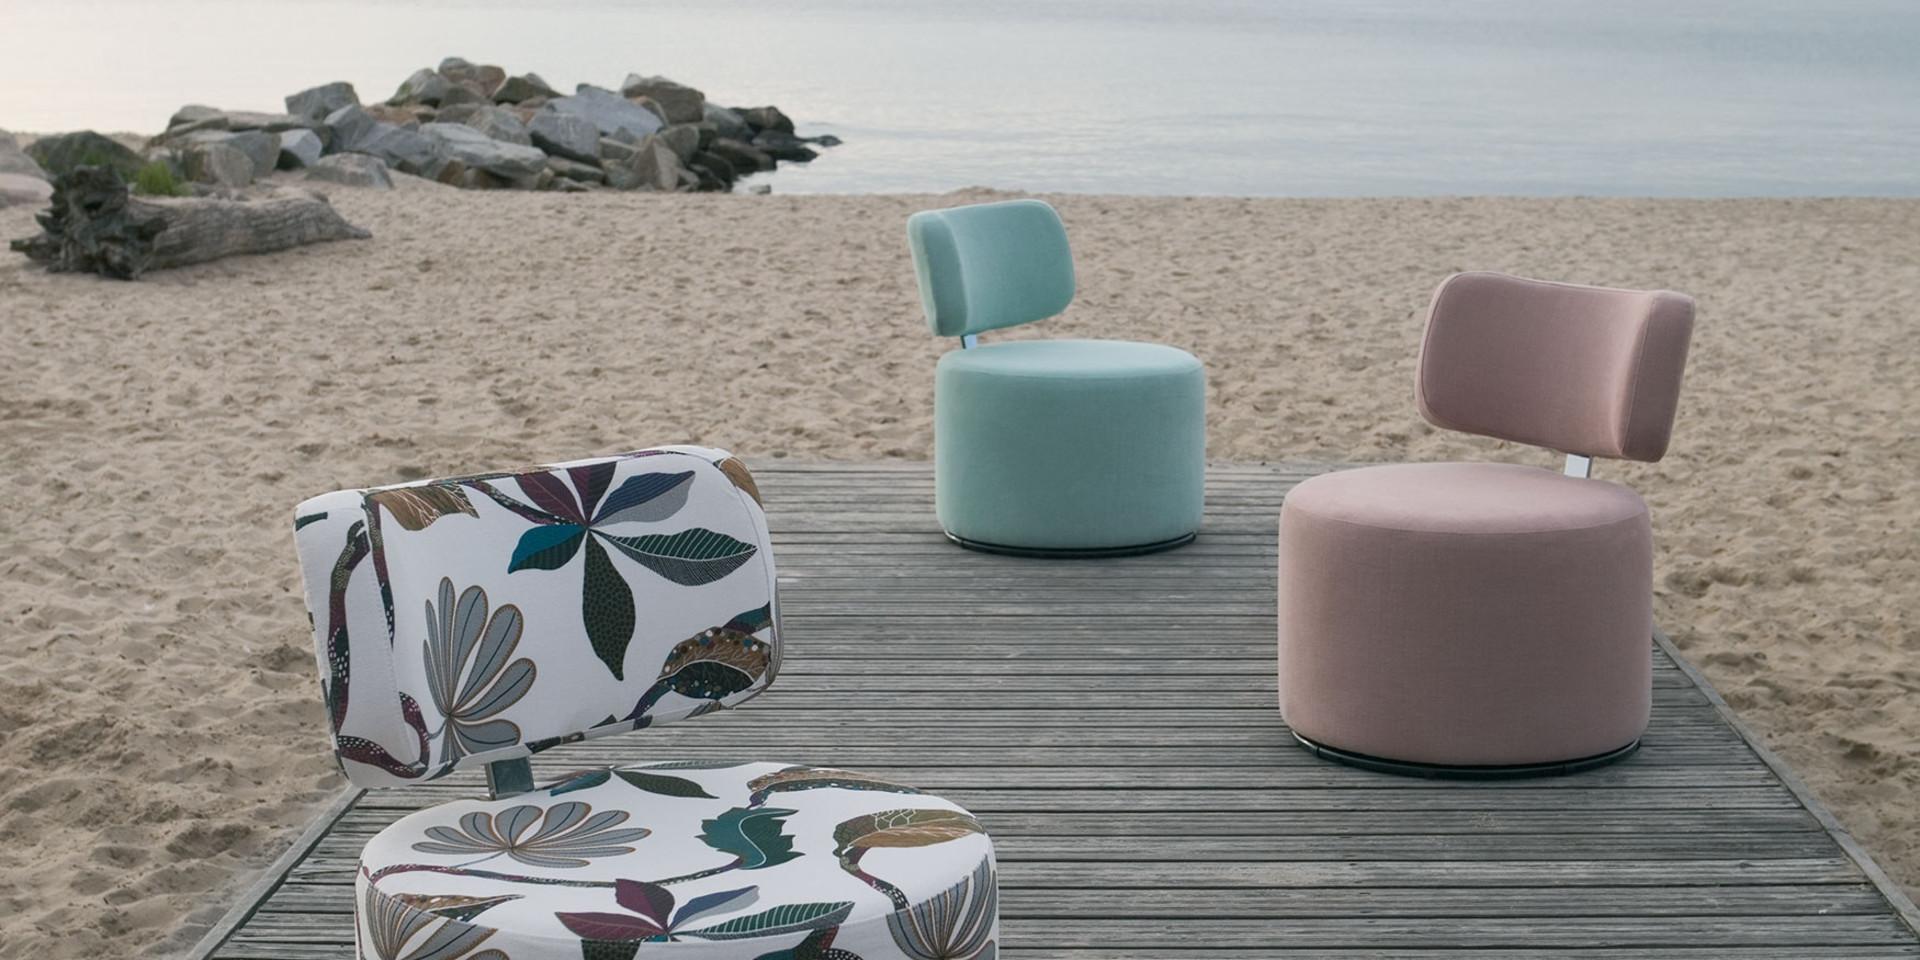 sits-mokka-ambiance-arrangement_armchair_swivel_thaiti_winter_MOKKA_armchair_swivel_caleido2248_mint_MOKKA_armchair_swivel_caleido2990_powder_pink_4_1